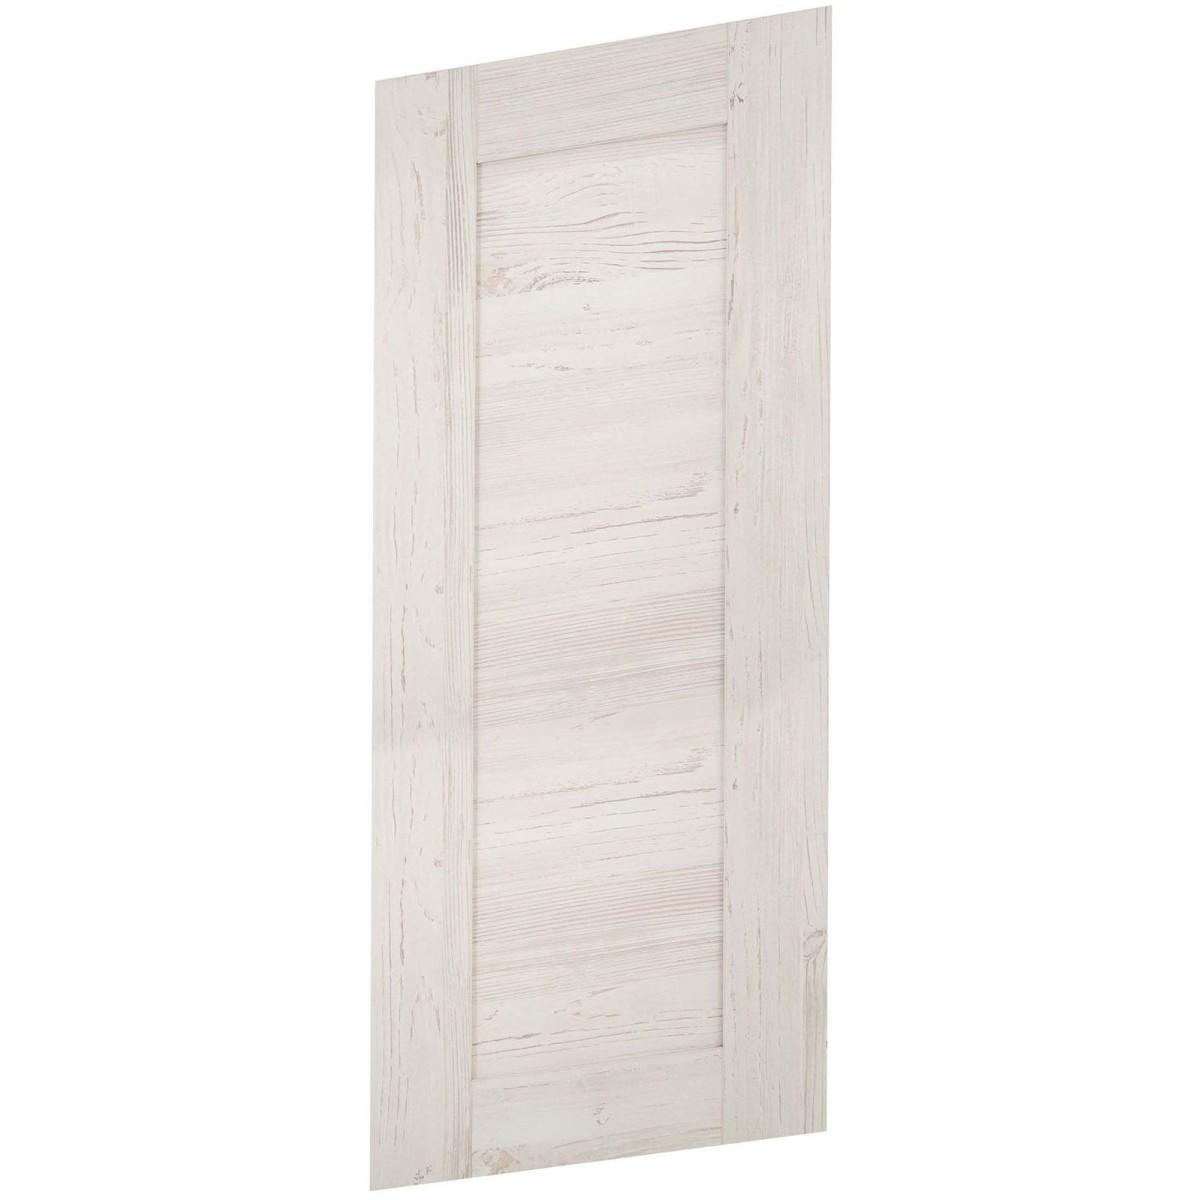 Дверь для шкафа Delinia ID «Фатеж» 40x102.4 см ЛДСП цвет белый